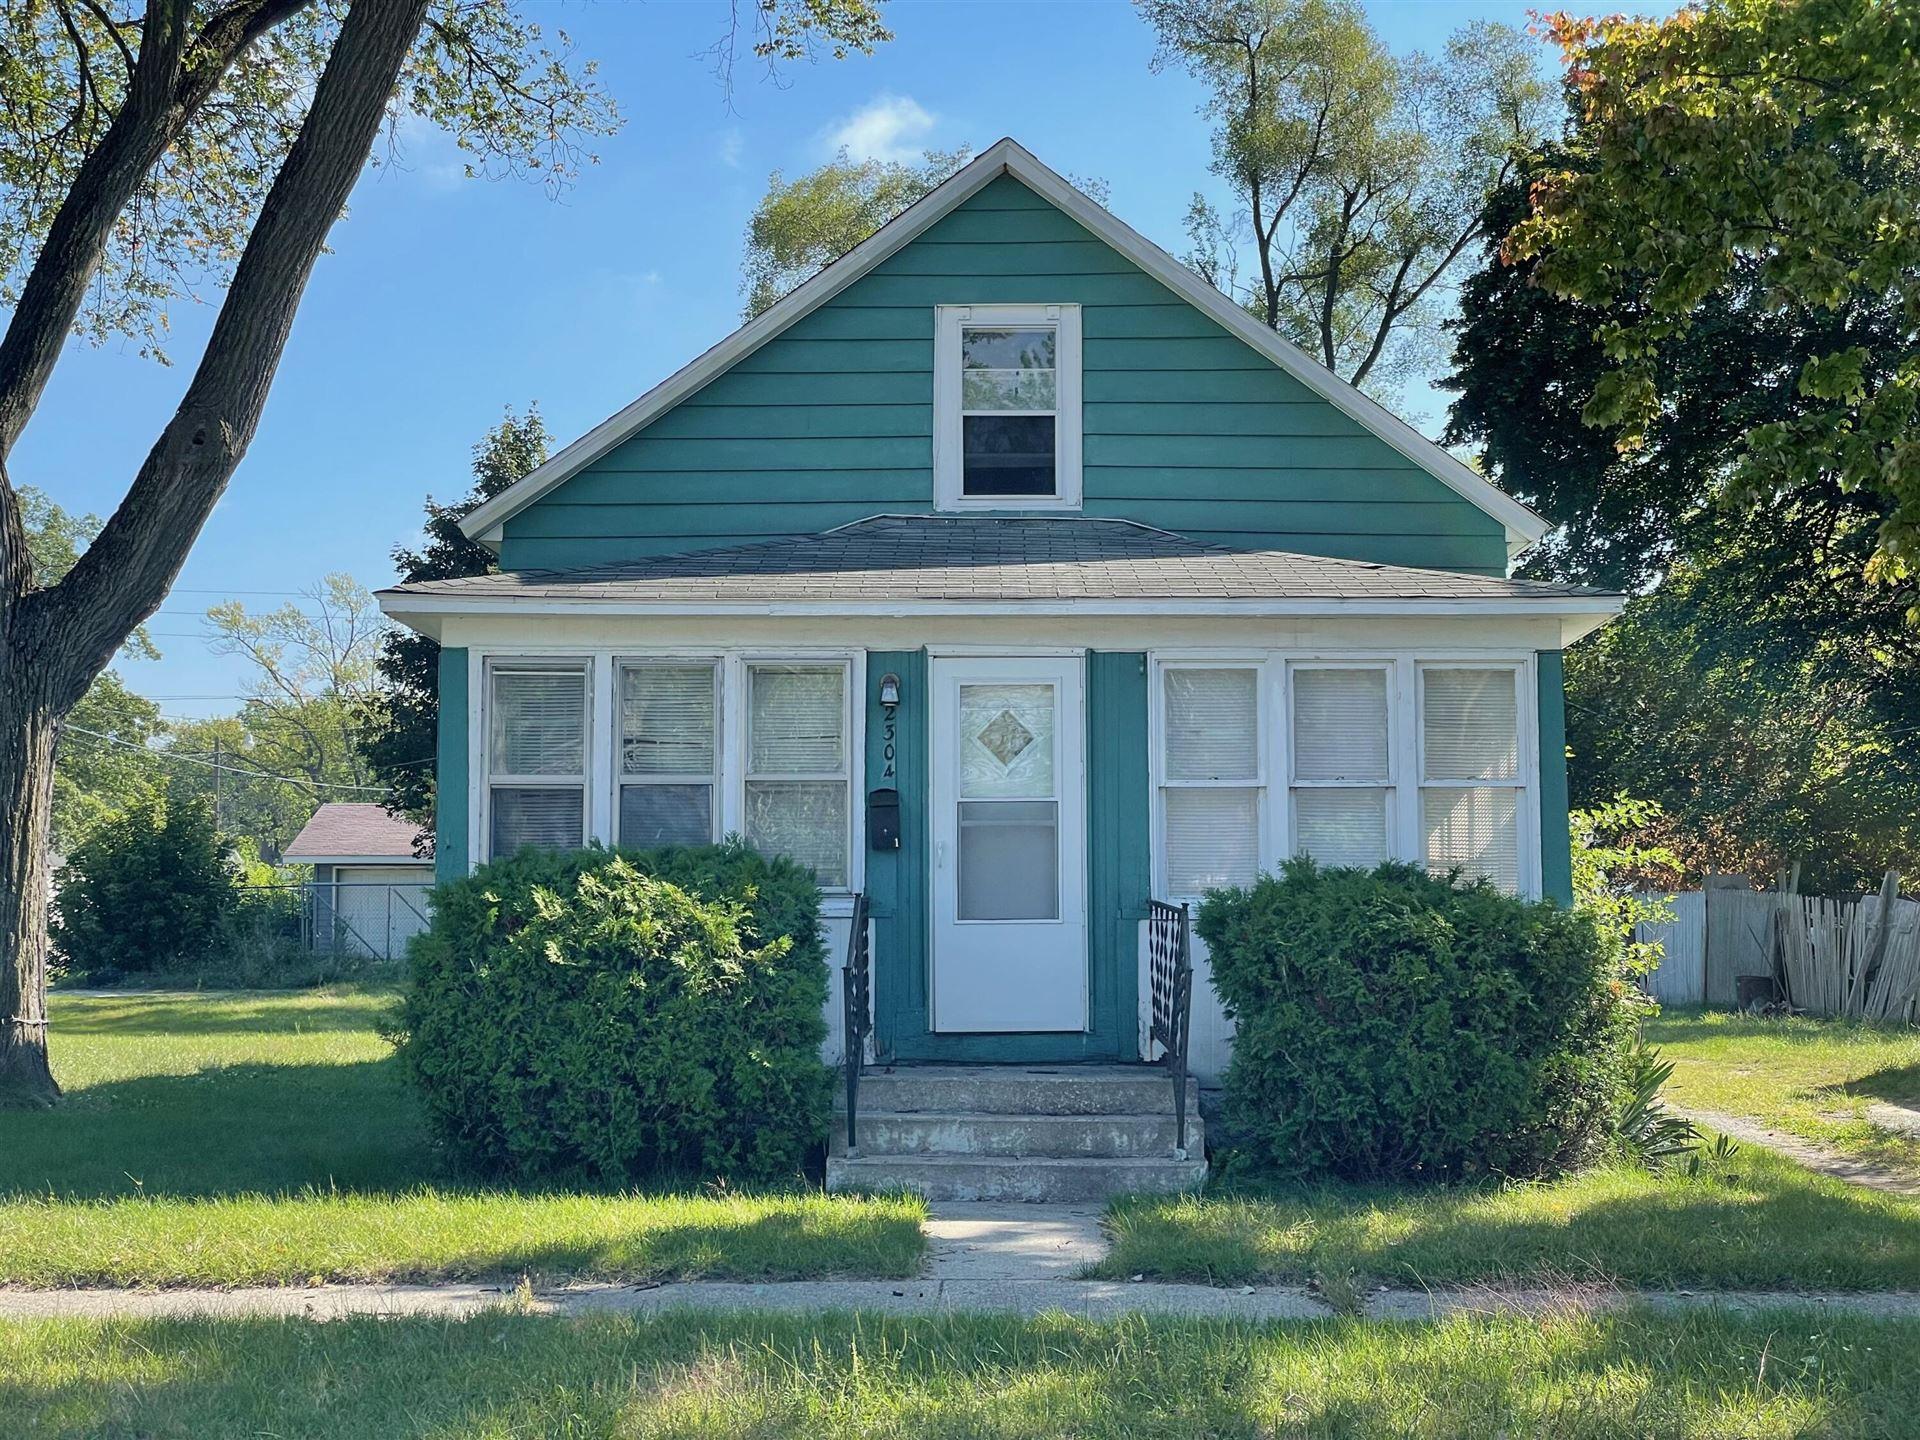 2304 Elwood Street, Muskegon Heights, MI 49444 - MLS#: 21107051